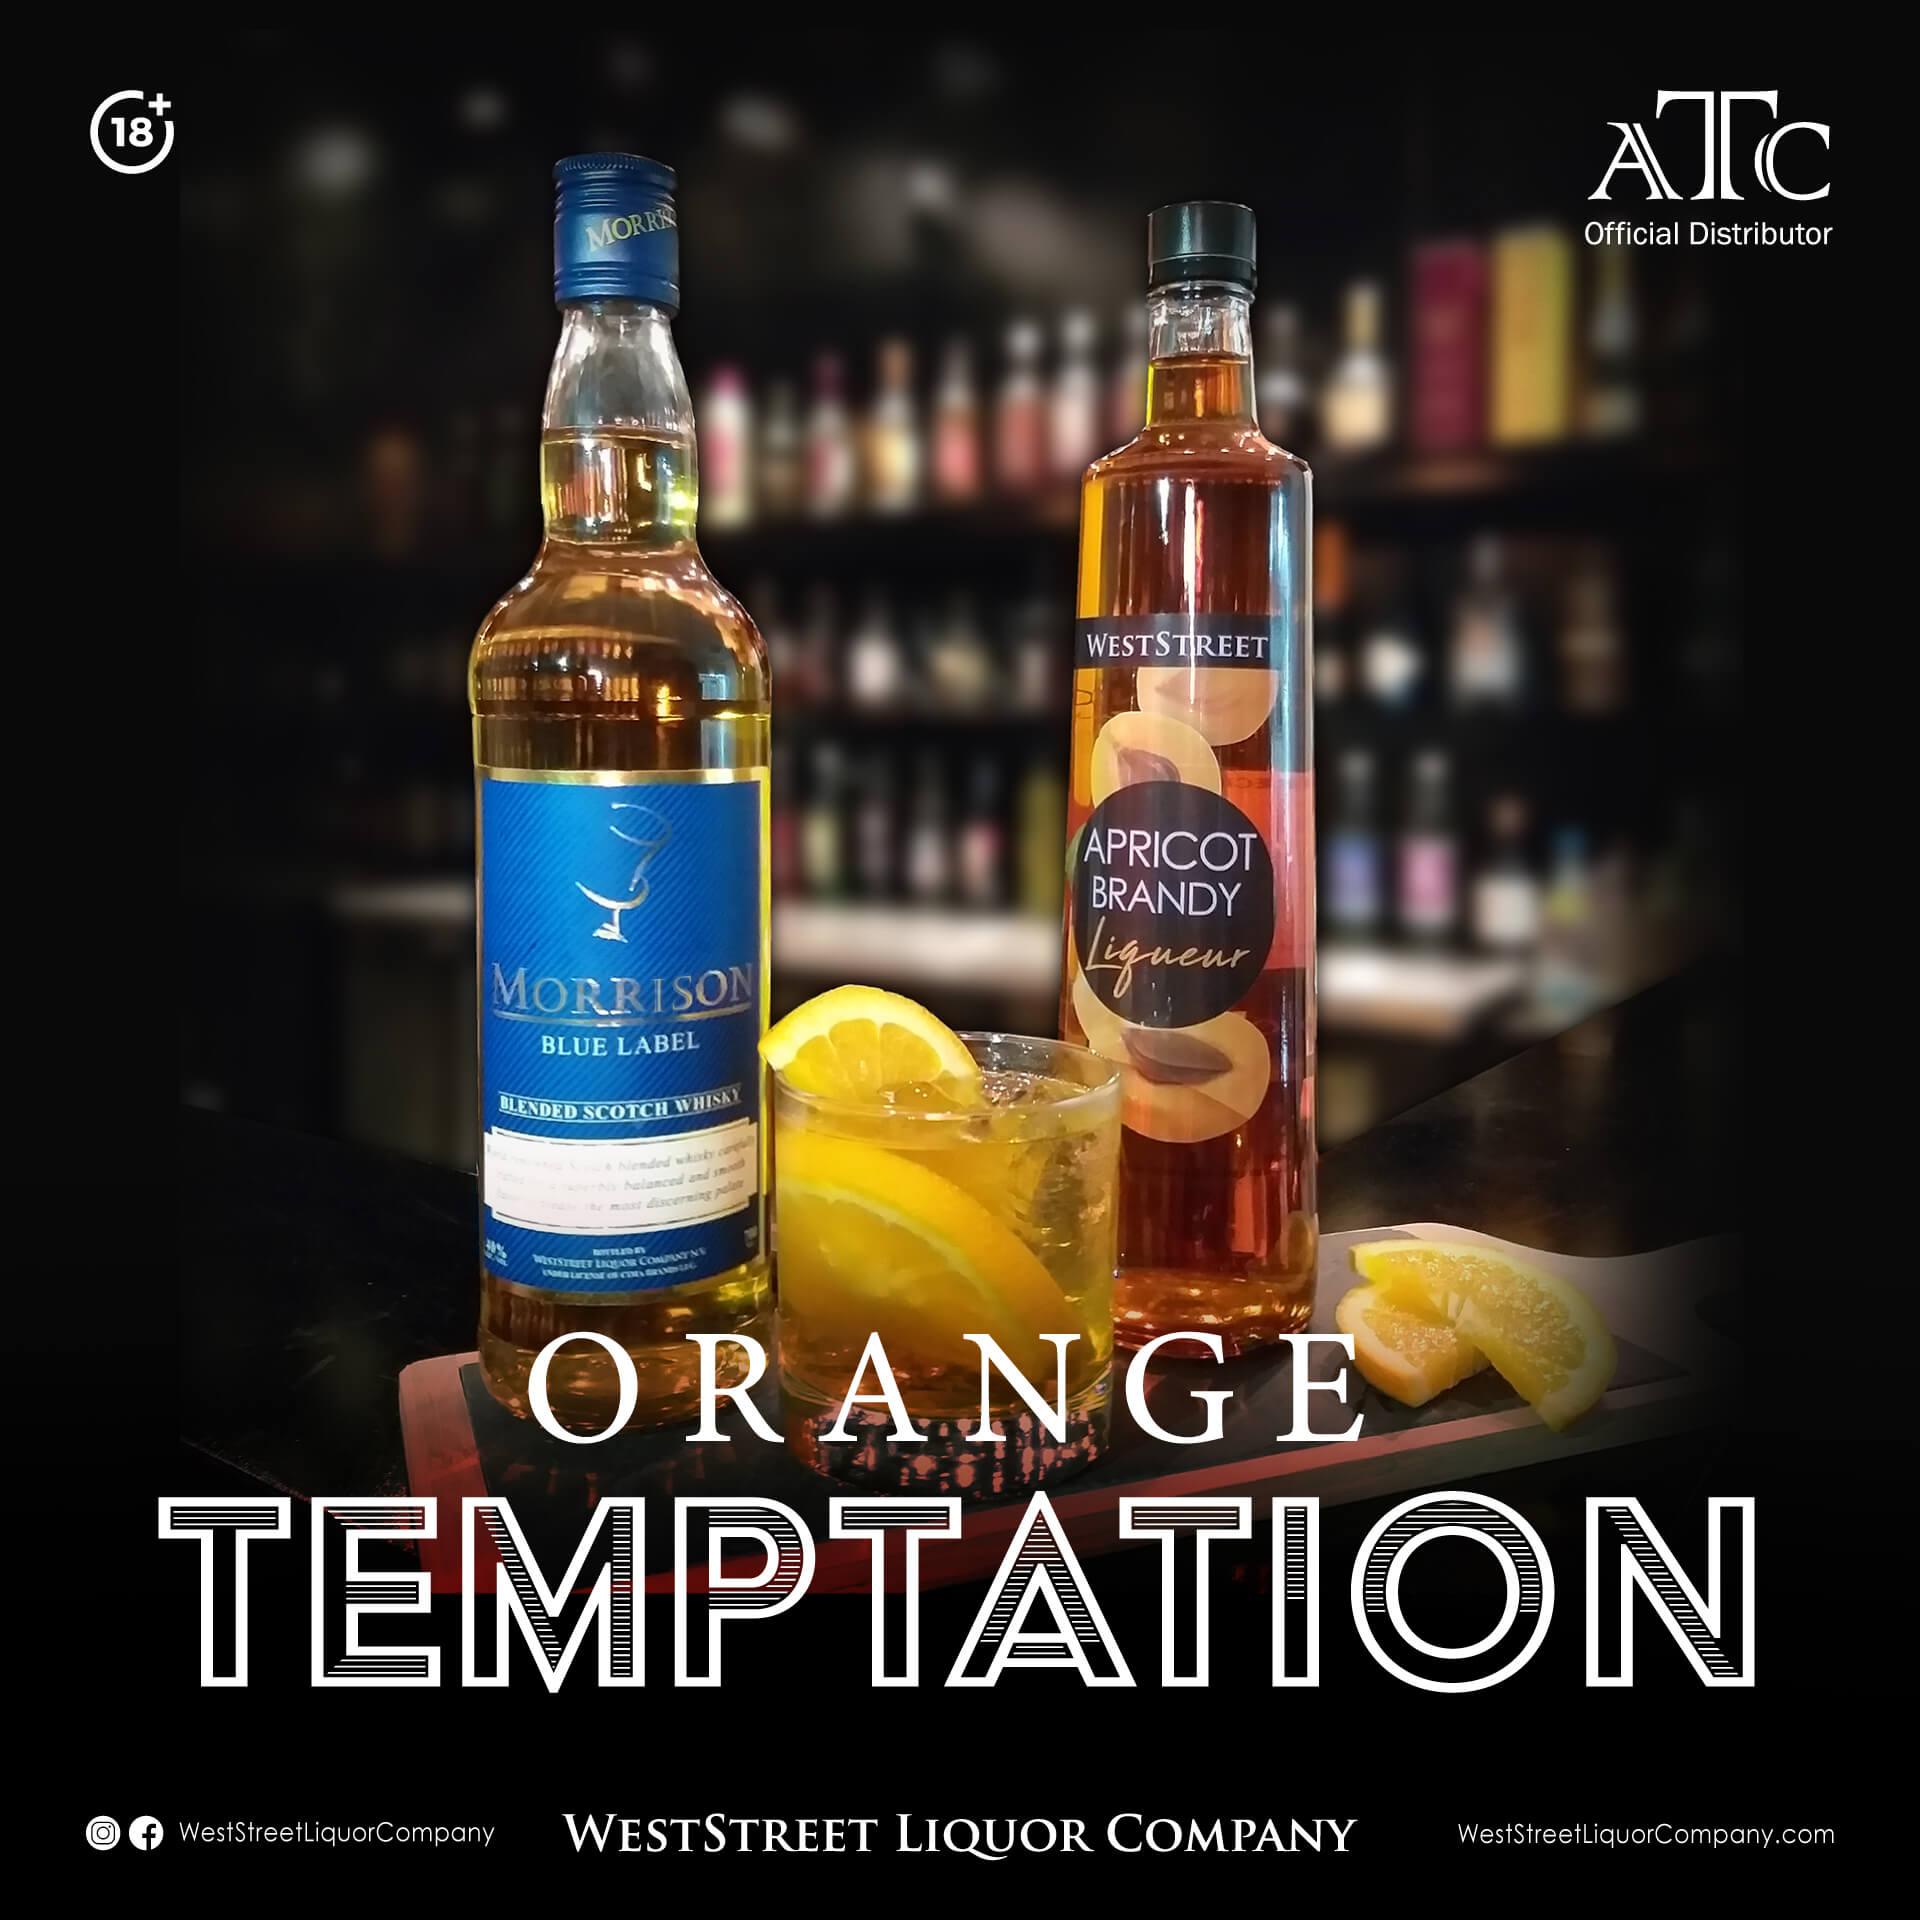 https://weststreetliquorcompany.com/wp-content/uploads/2021/07/21074BTL-Orange-Temptation-1920x1920px-1.jpg